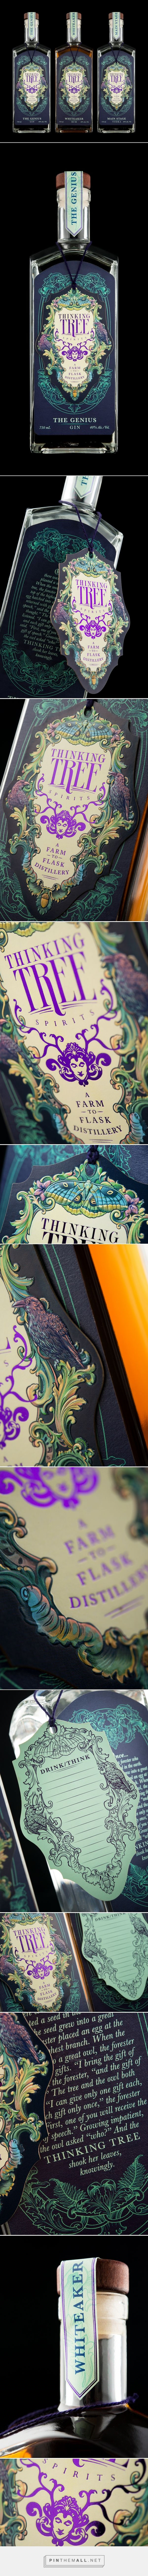 Thinking Tree Spirits packaging design by Hired Guns Creative - http://www.packagingoftheworld.com/2016/11/thinking-tree-spirits.html